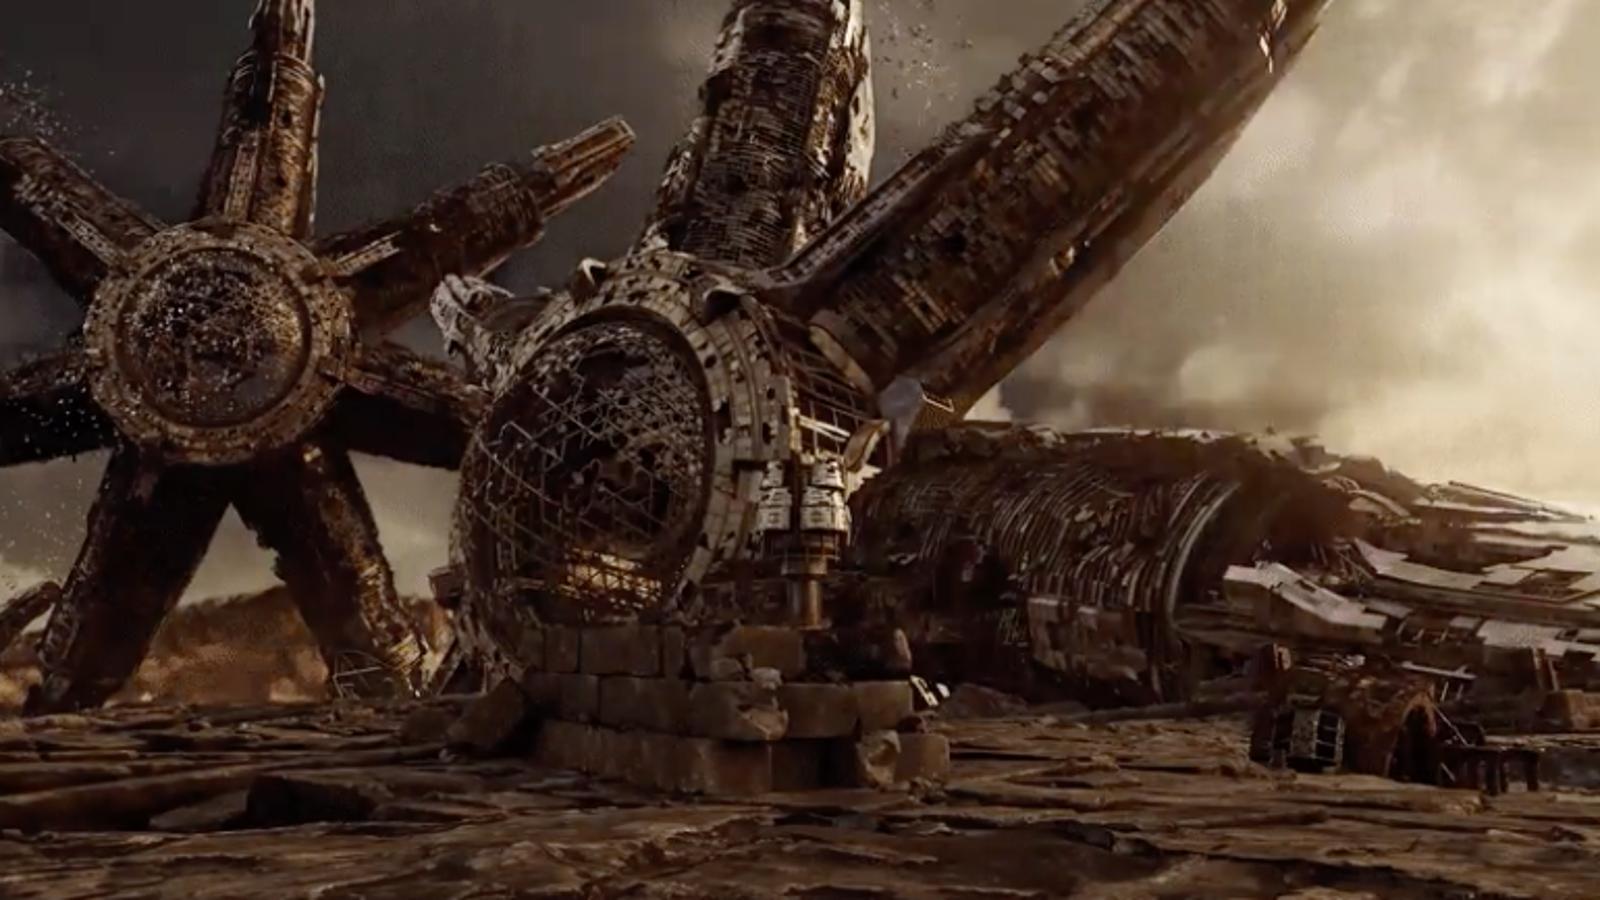 How Weta VFX Helped Bring Avengers: Infinity War to Life